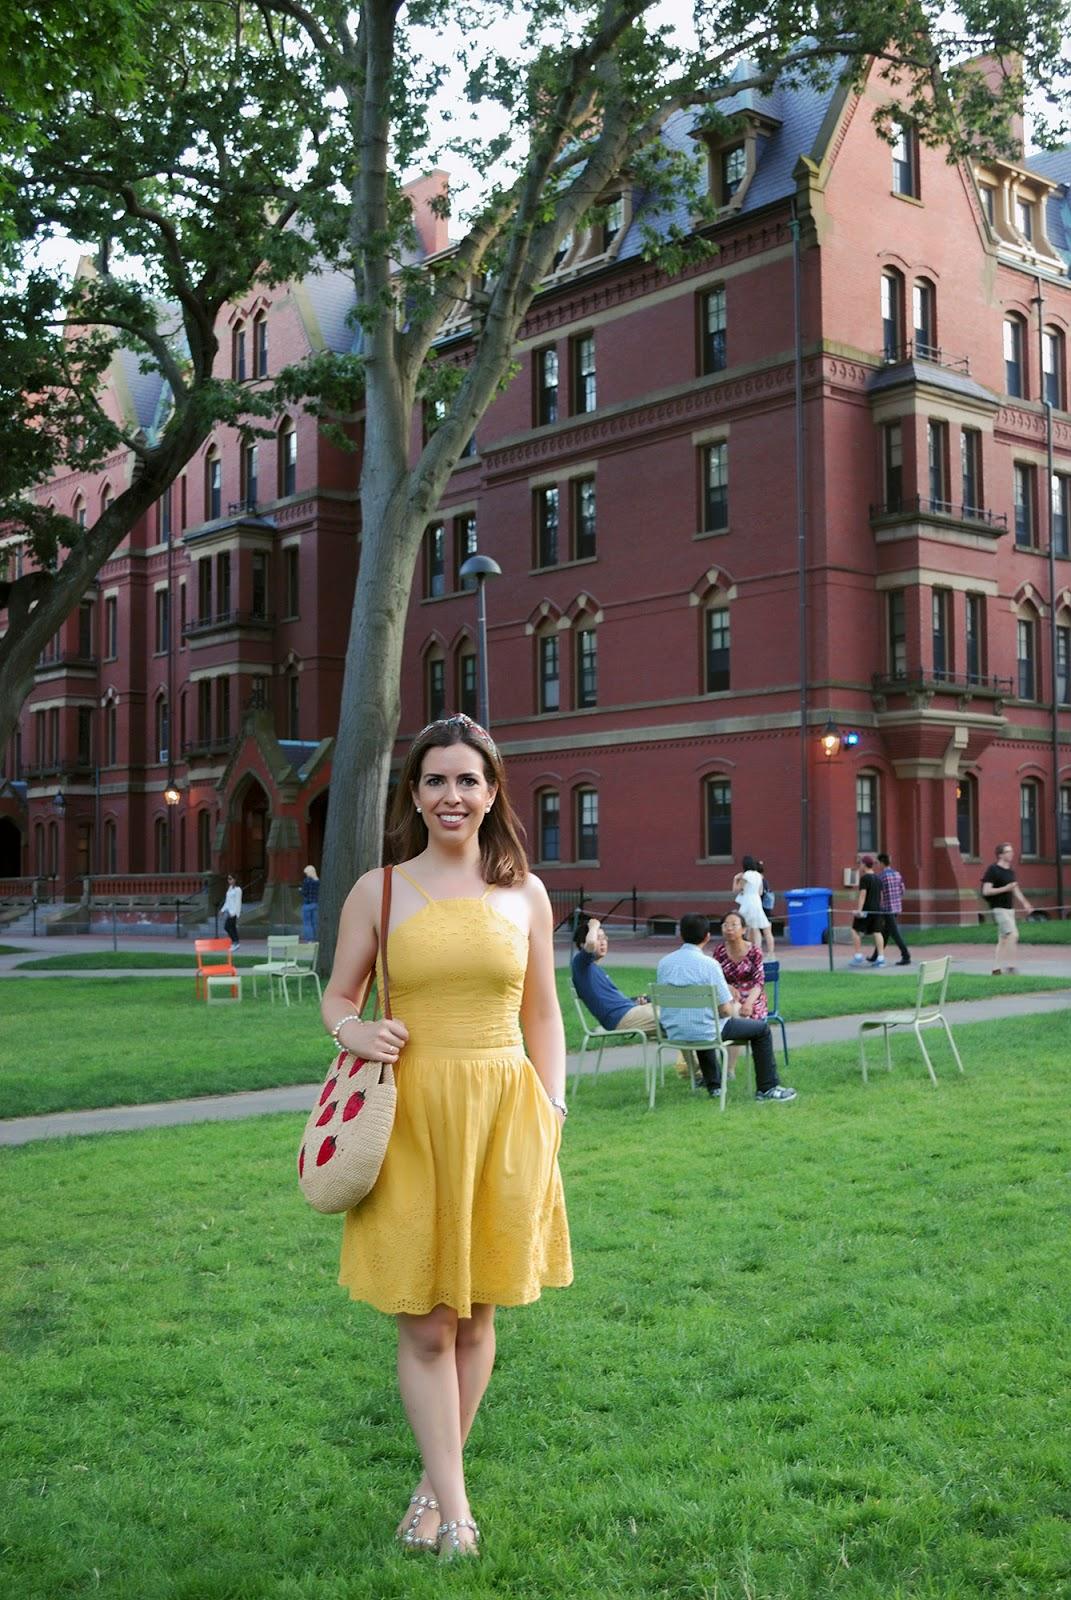 harvard university cambridge boston itinerary plan guide tourism usa america park east coast